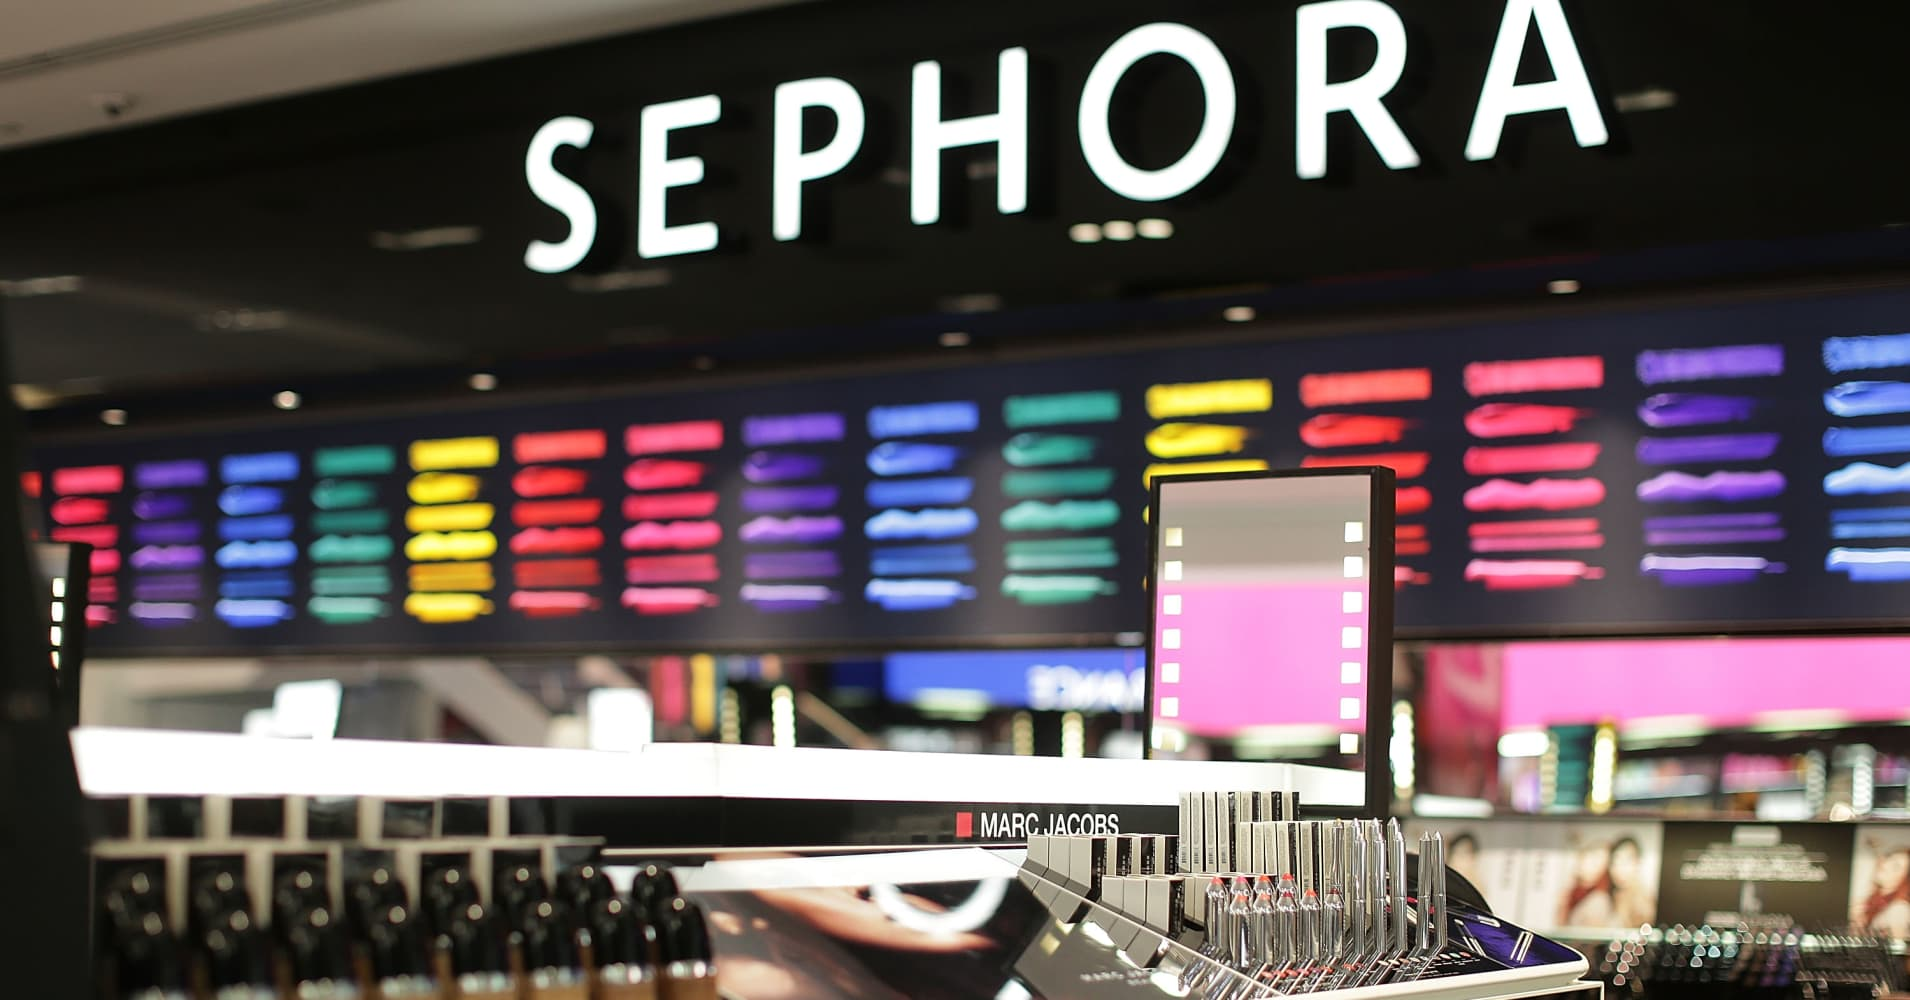 Sephora, Ulta, and the $48 3 billion makeup industry